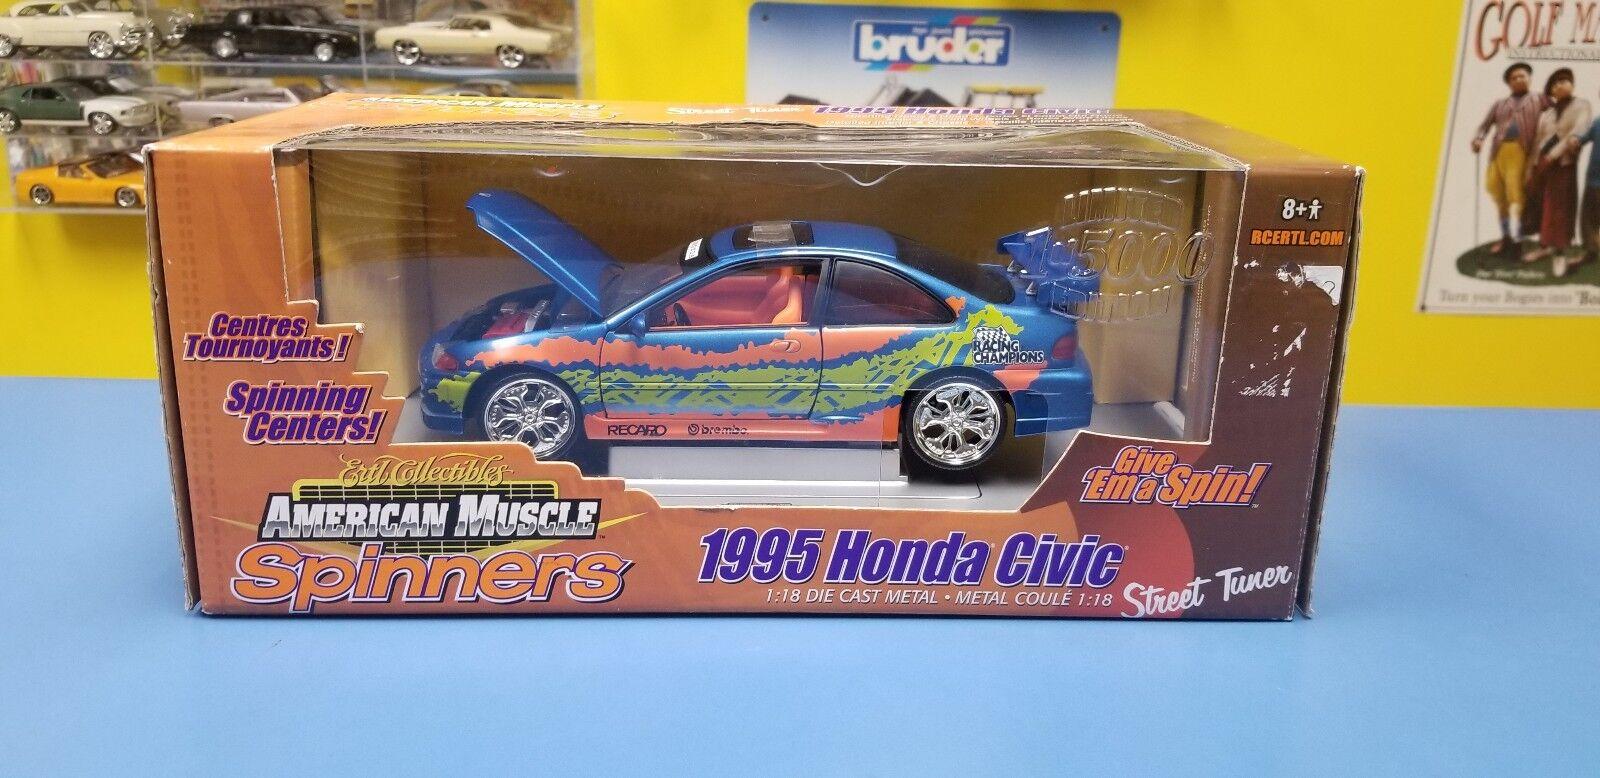 ERTL  AMERICAN MUSCLE STREET  TUNER SPINNERS 1995 HONDA CIVIC  1 OF 5000  NEW